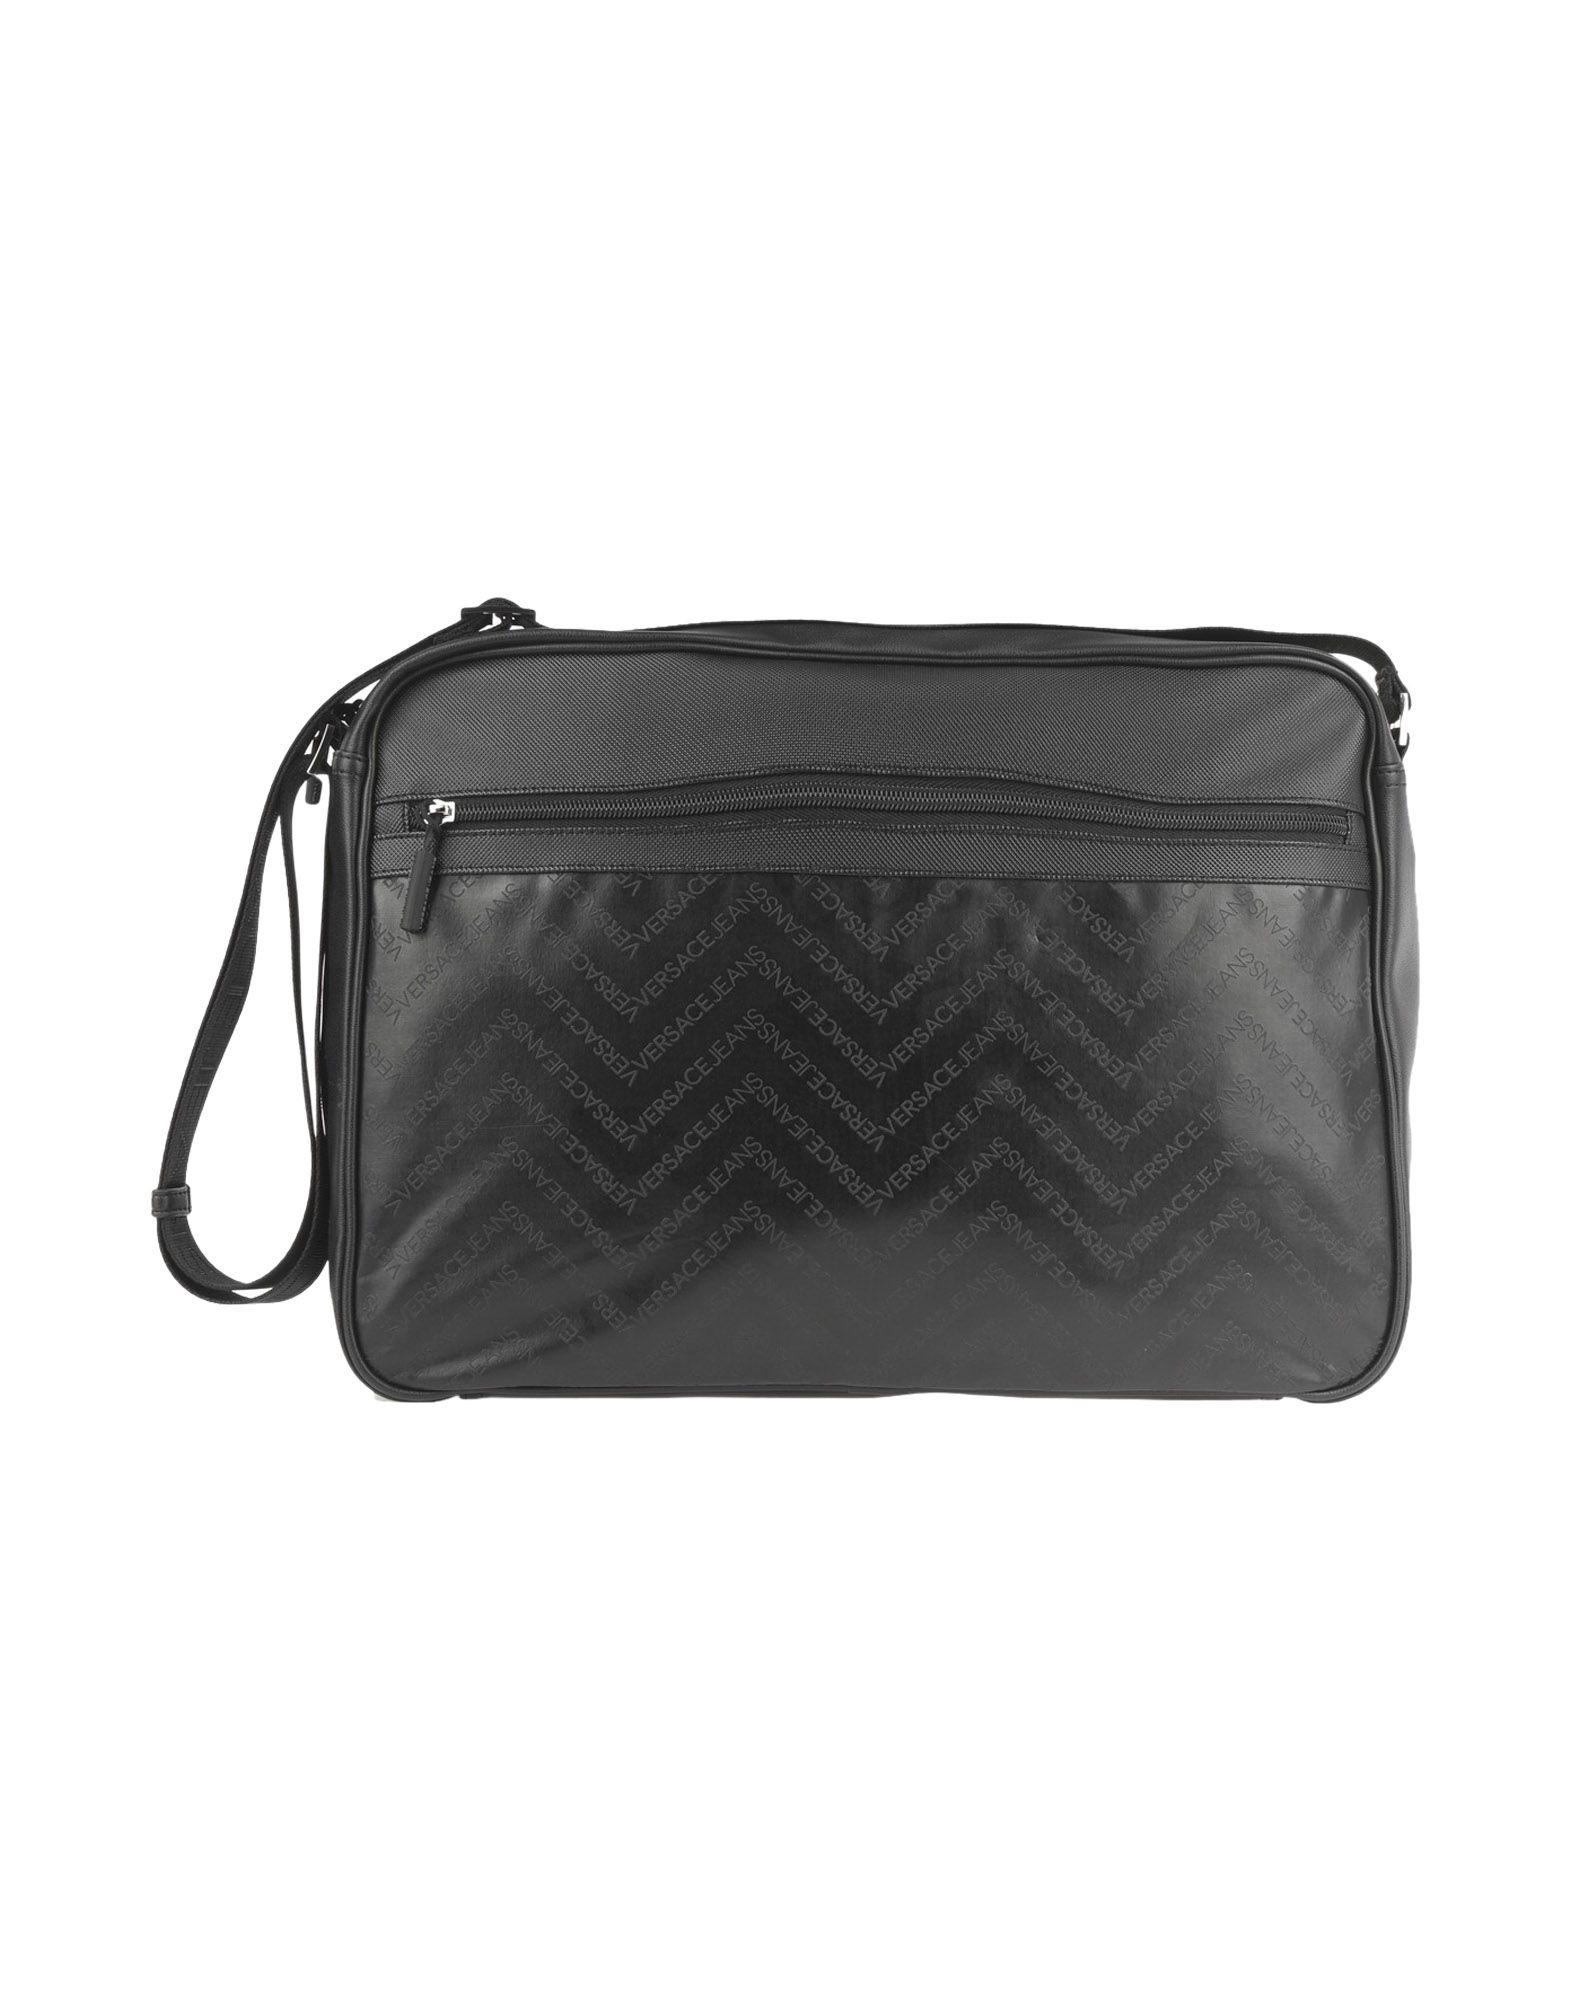 VERSACE JEANS Деловые сумки victorinox деловые сумки